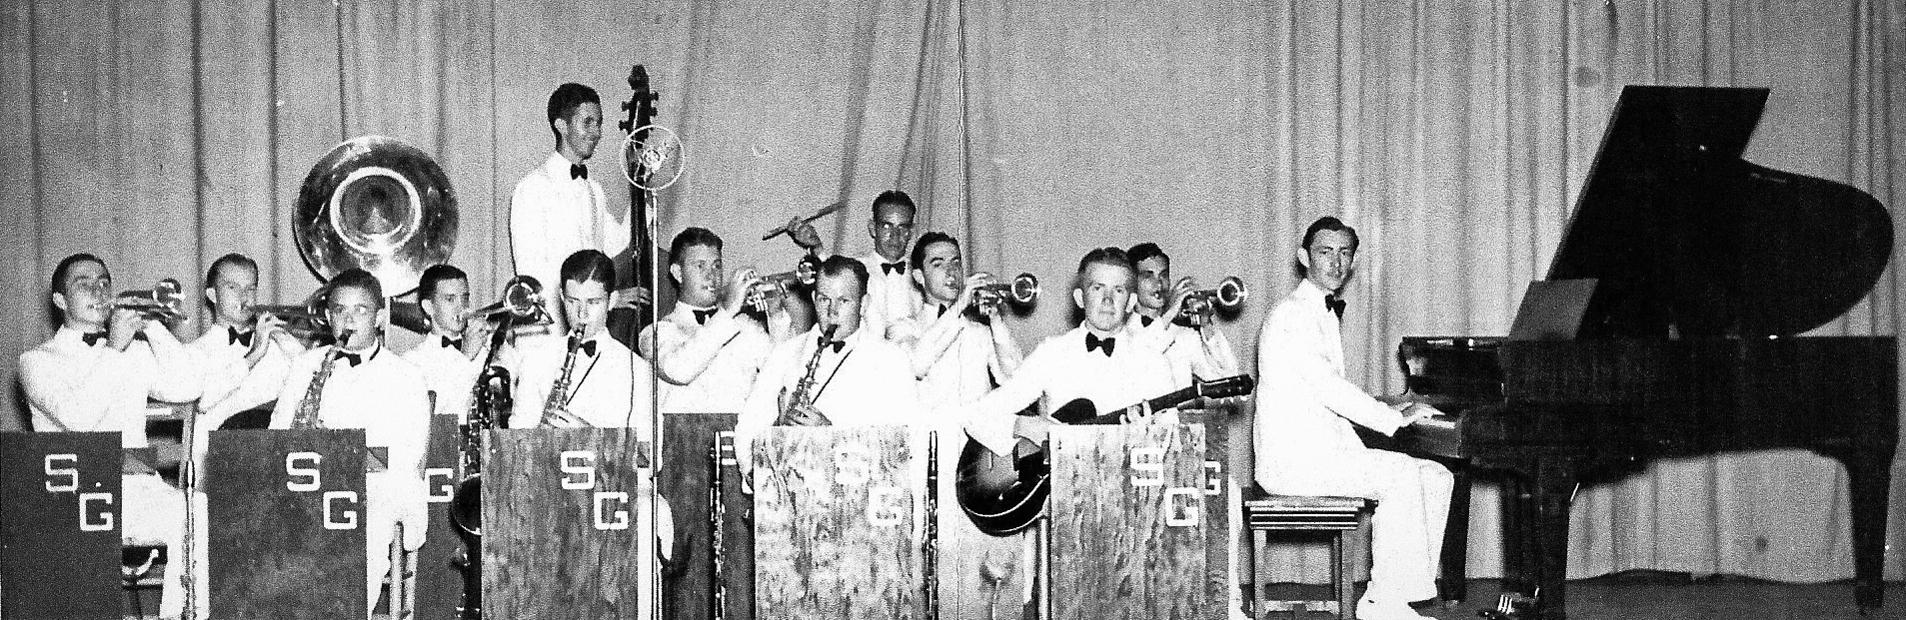 Southern Gentlemen dance band, c. 1940